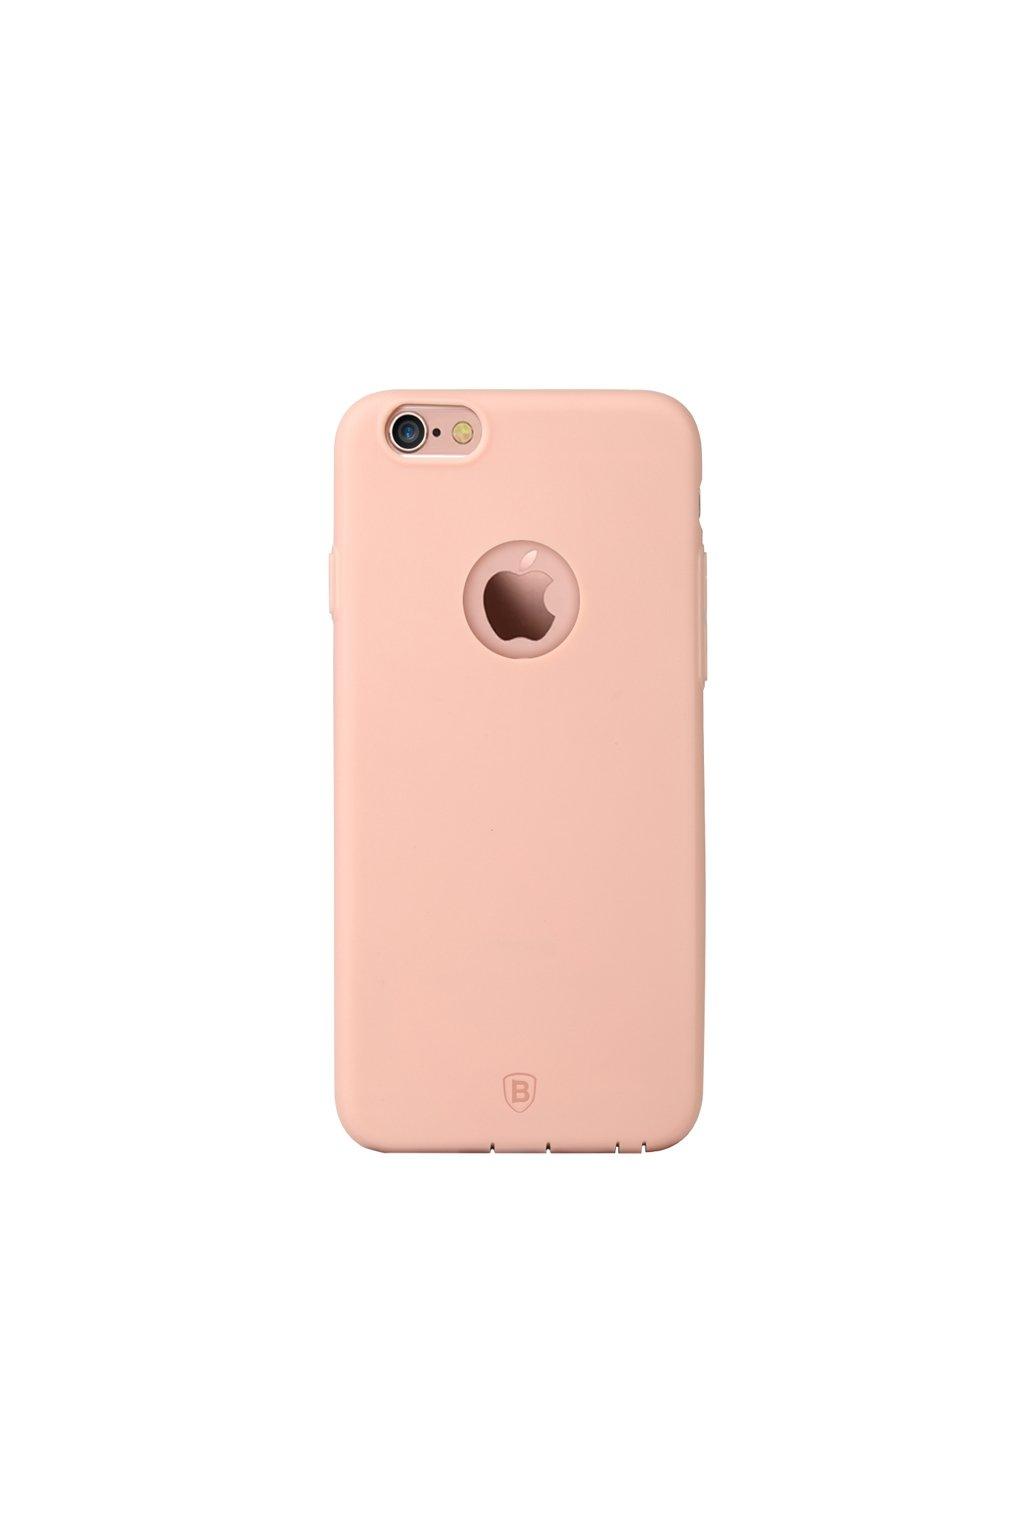 Pouzdro Apple iPhone 6/6S Plus Baseus TPU Mousse, pink